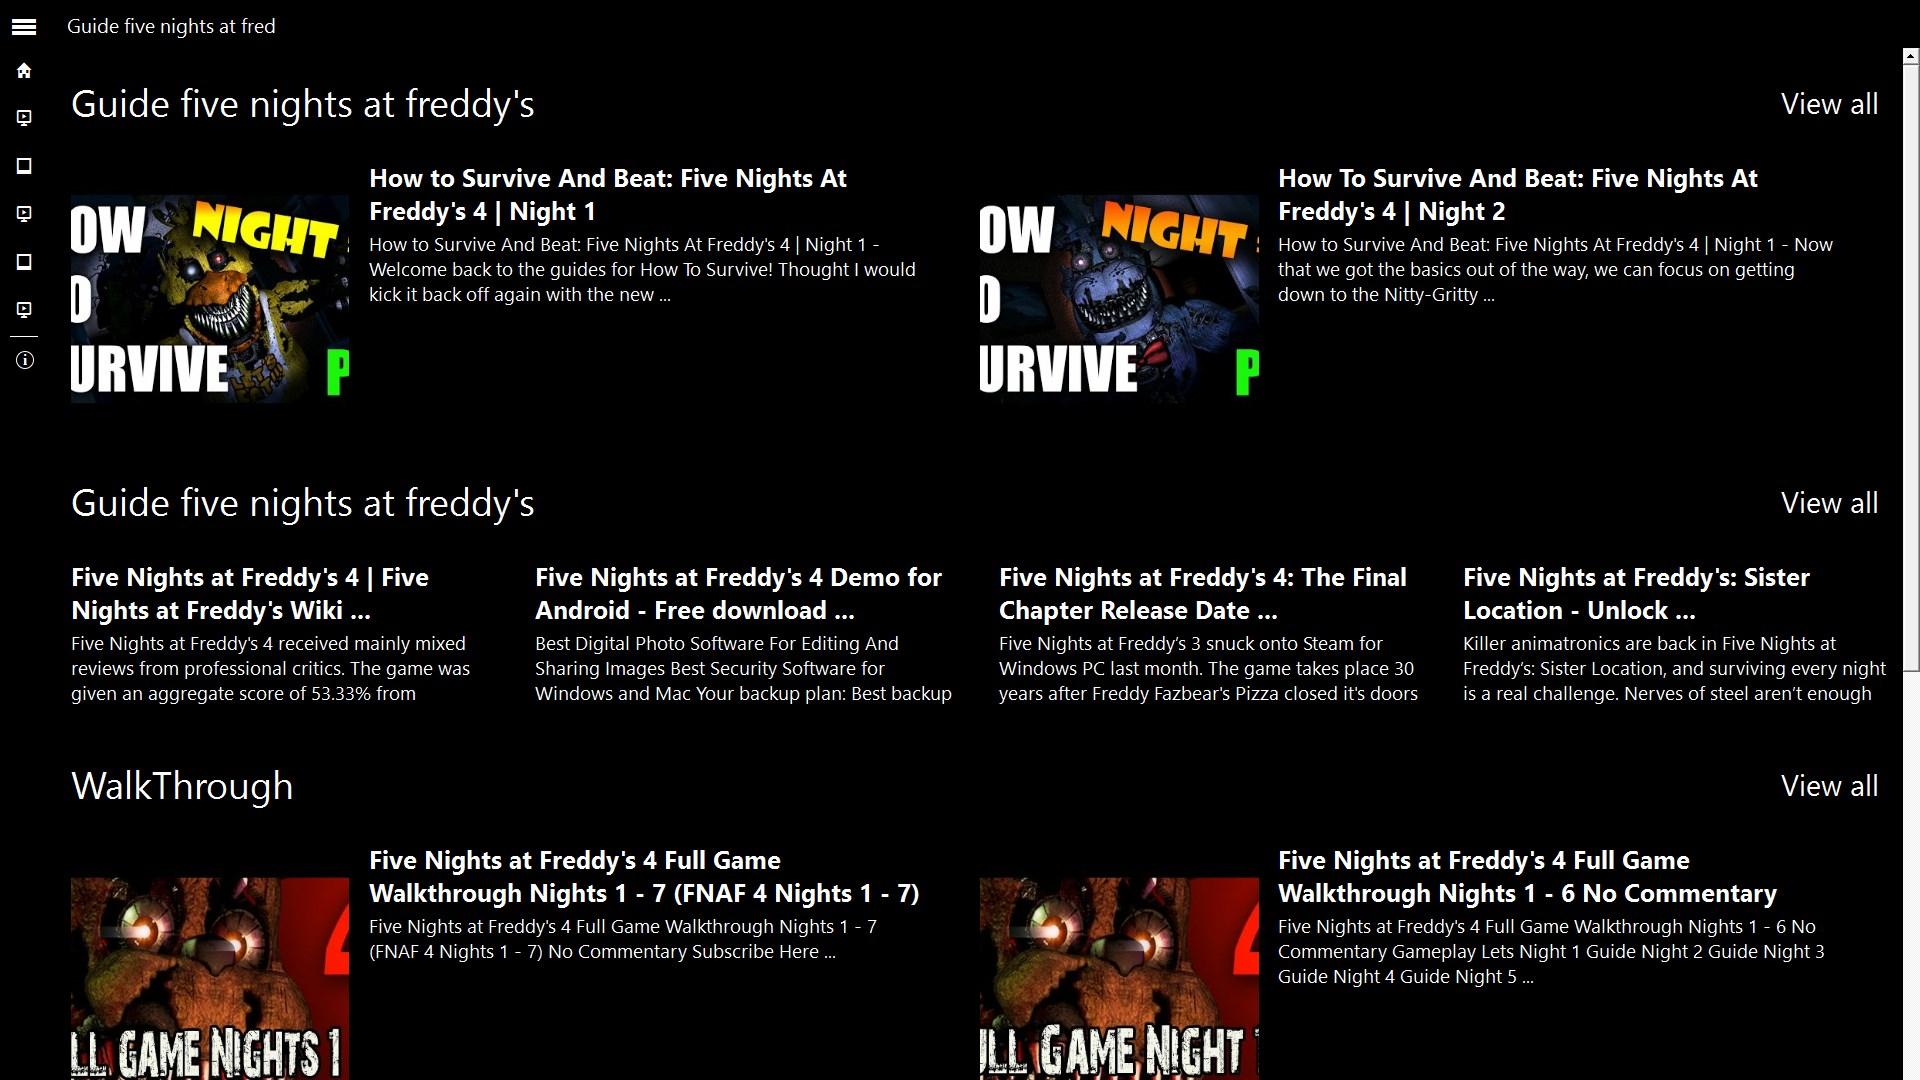 Five nights at Freddys UserGuide | FREE Windows Phone app market